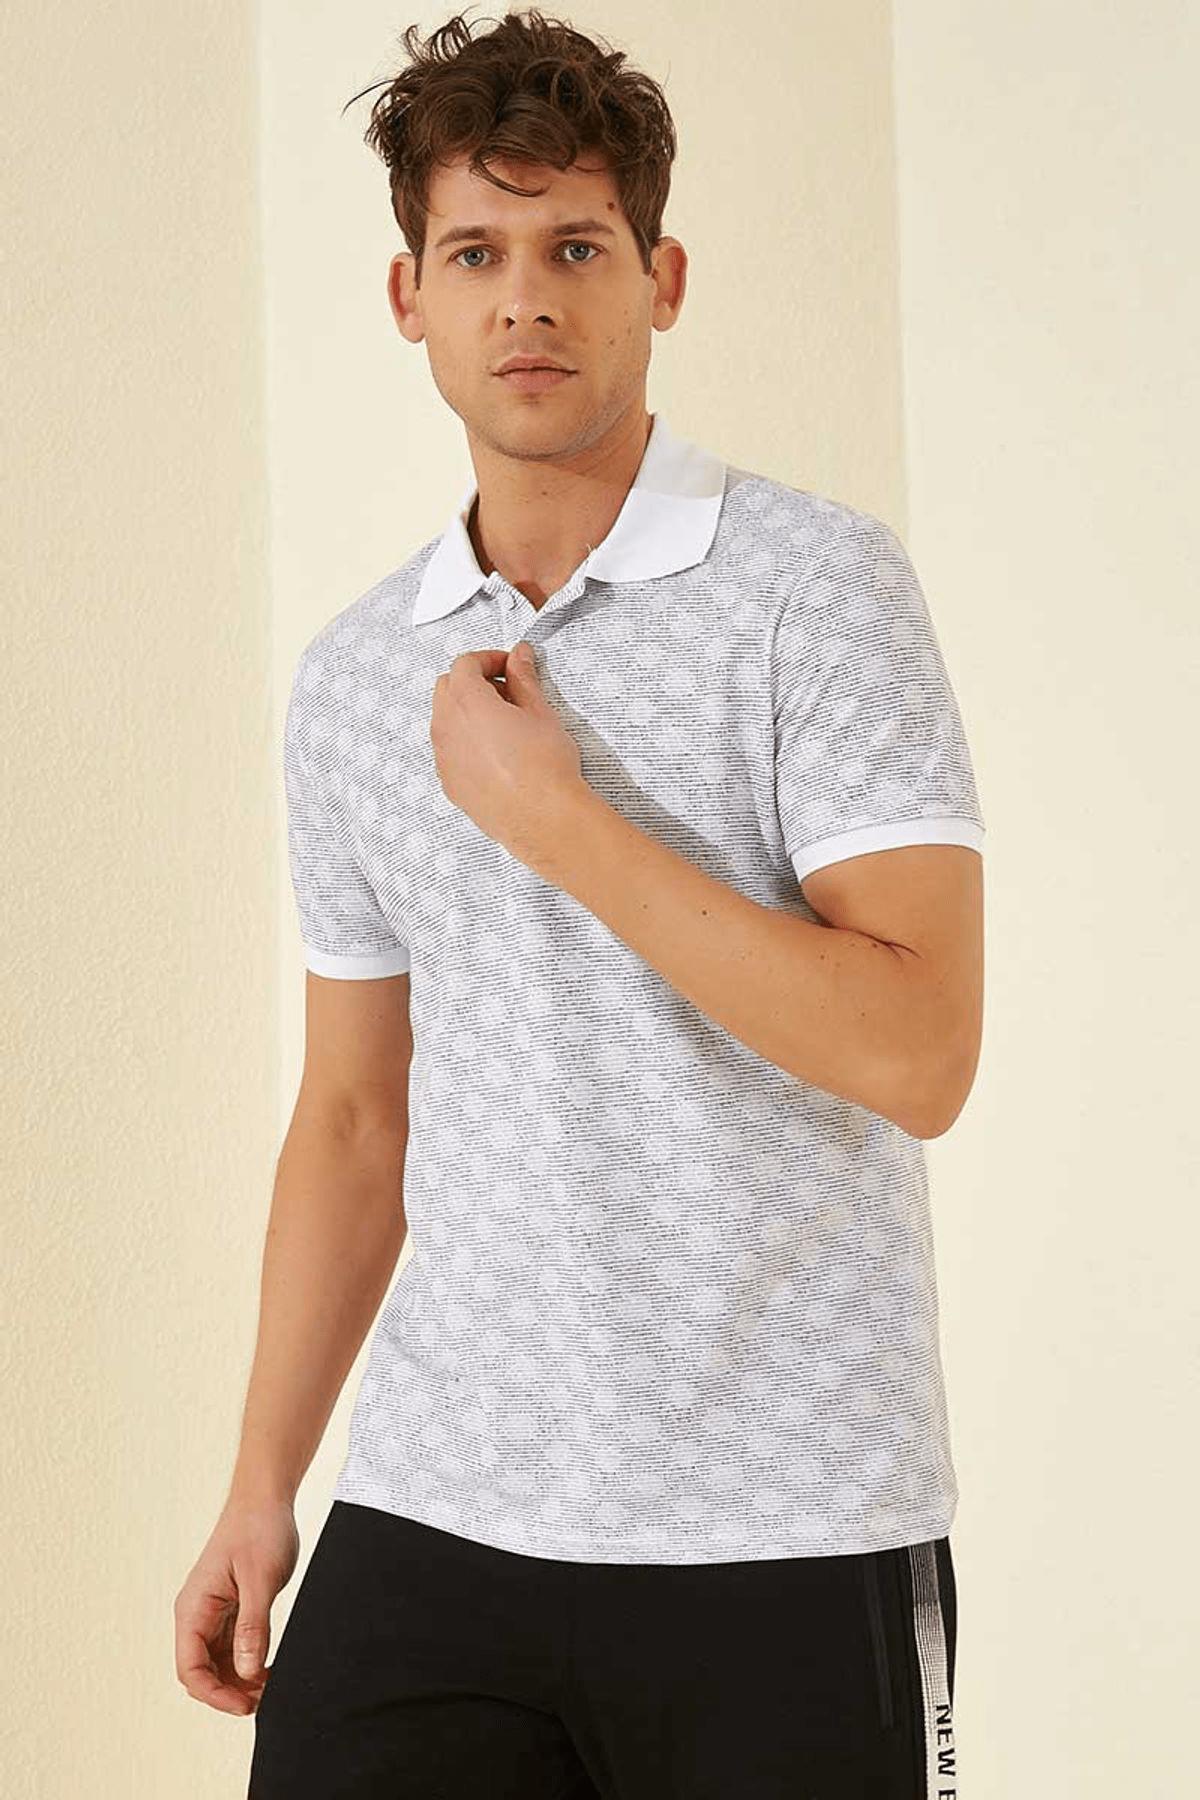 Tommy Life Baskılı Polo Yaka Beyaz Erkek T-Shirt T08ER-87796_1 1